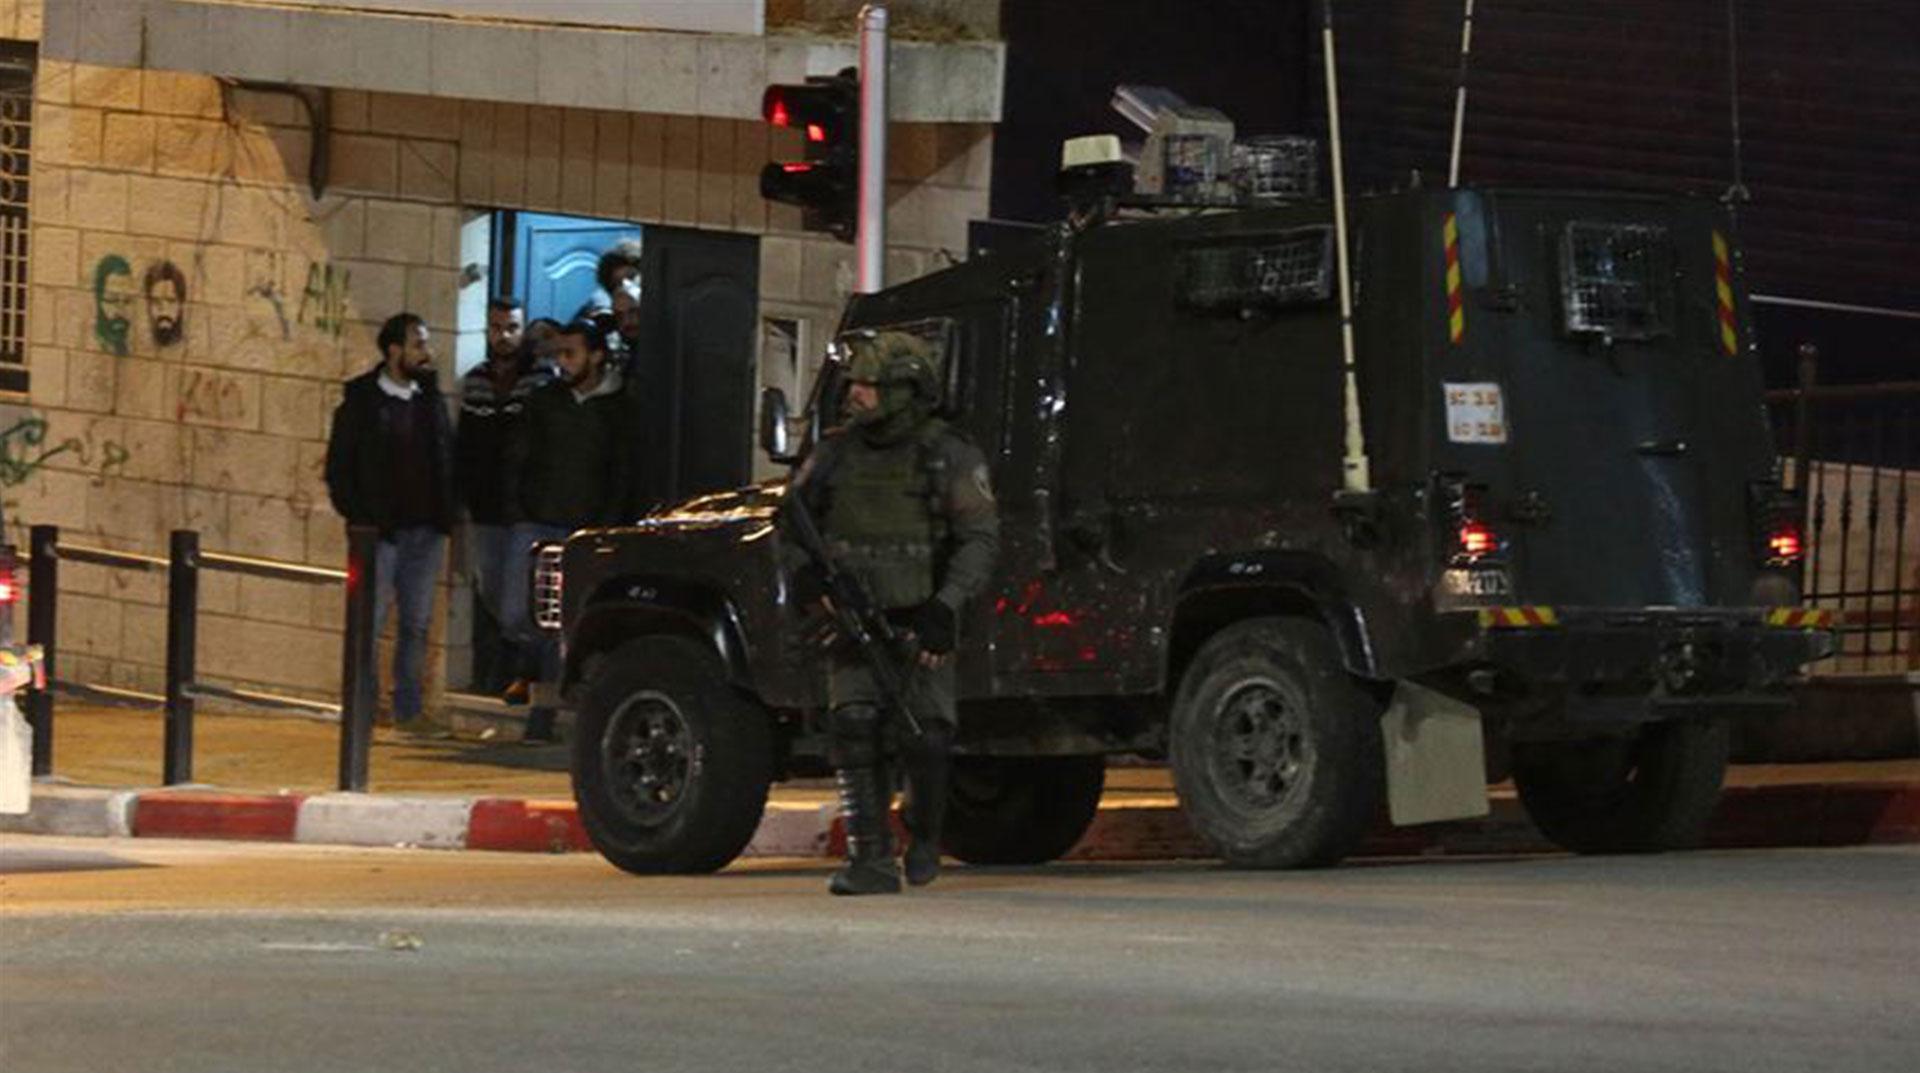 İşgalci Siyonistler Filistinli Bir Genci Ağır Yaraladı